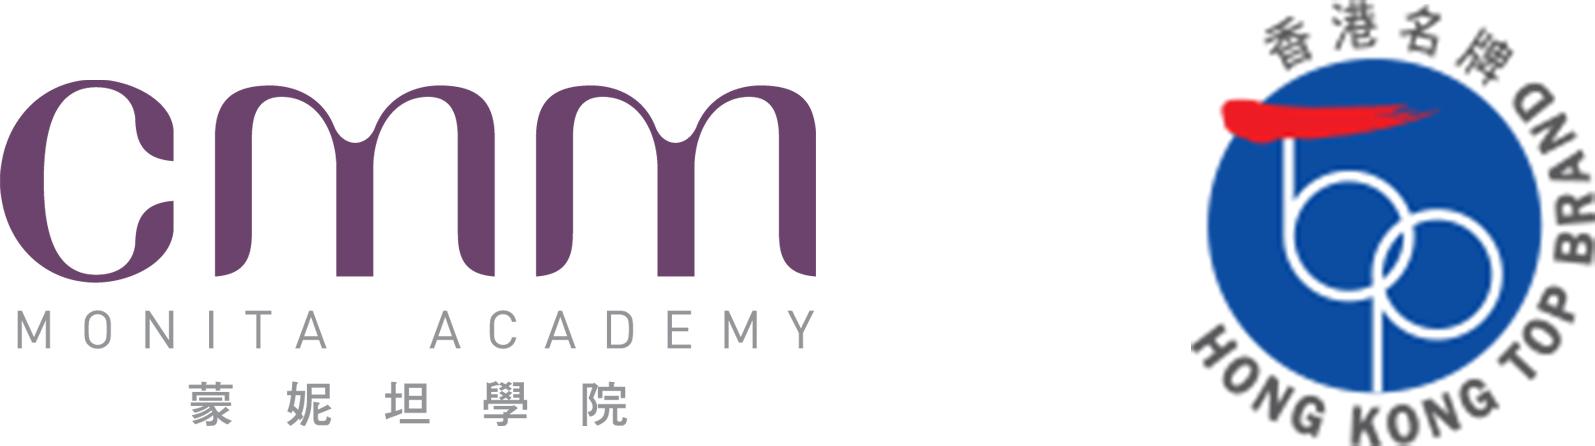 CMM 蒙妮坦學院 CMM Monita Academy 查詢電話: 23287223 Whatsapp: 64246409